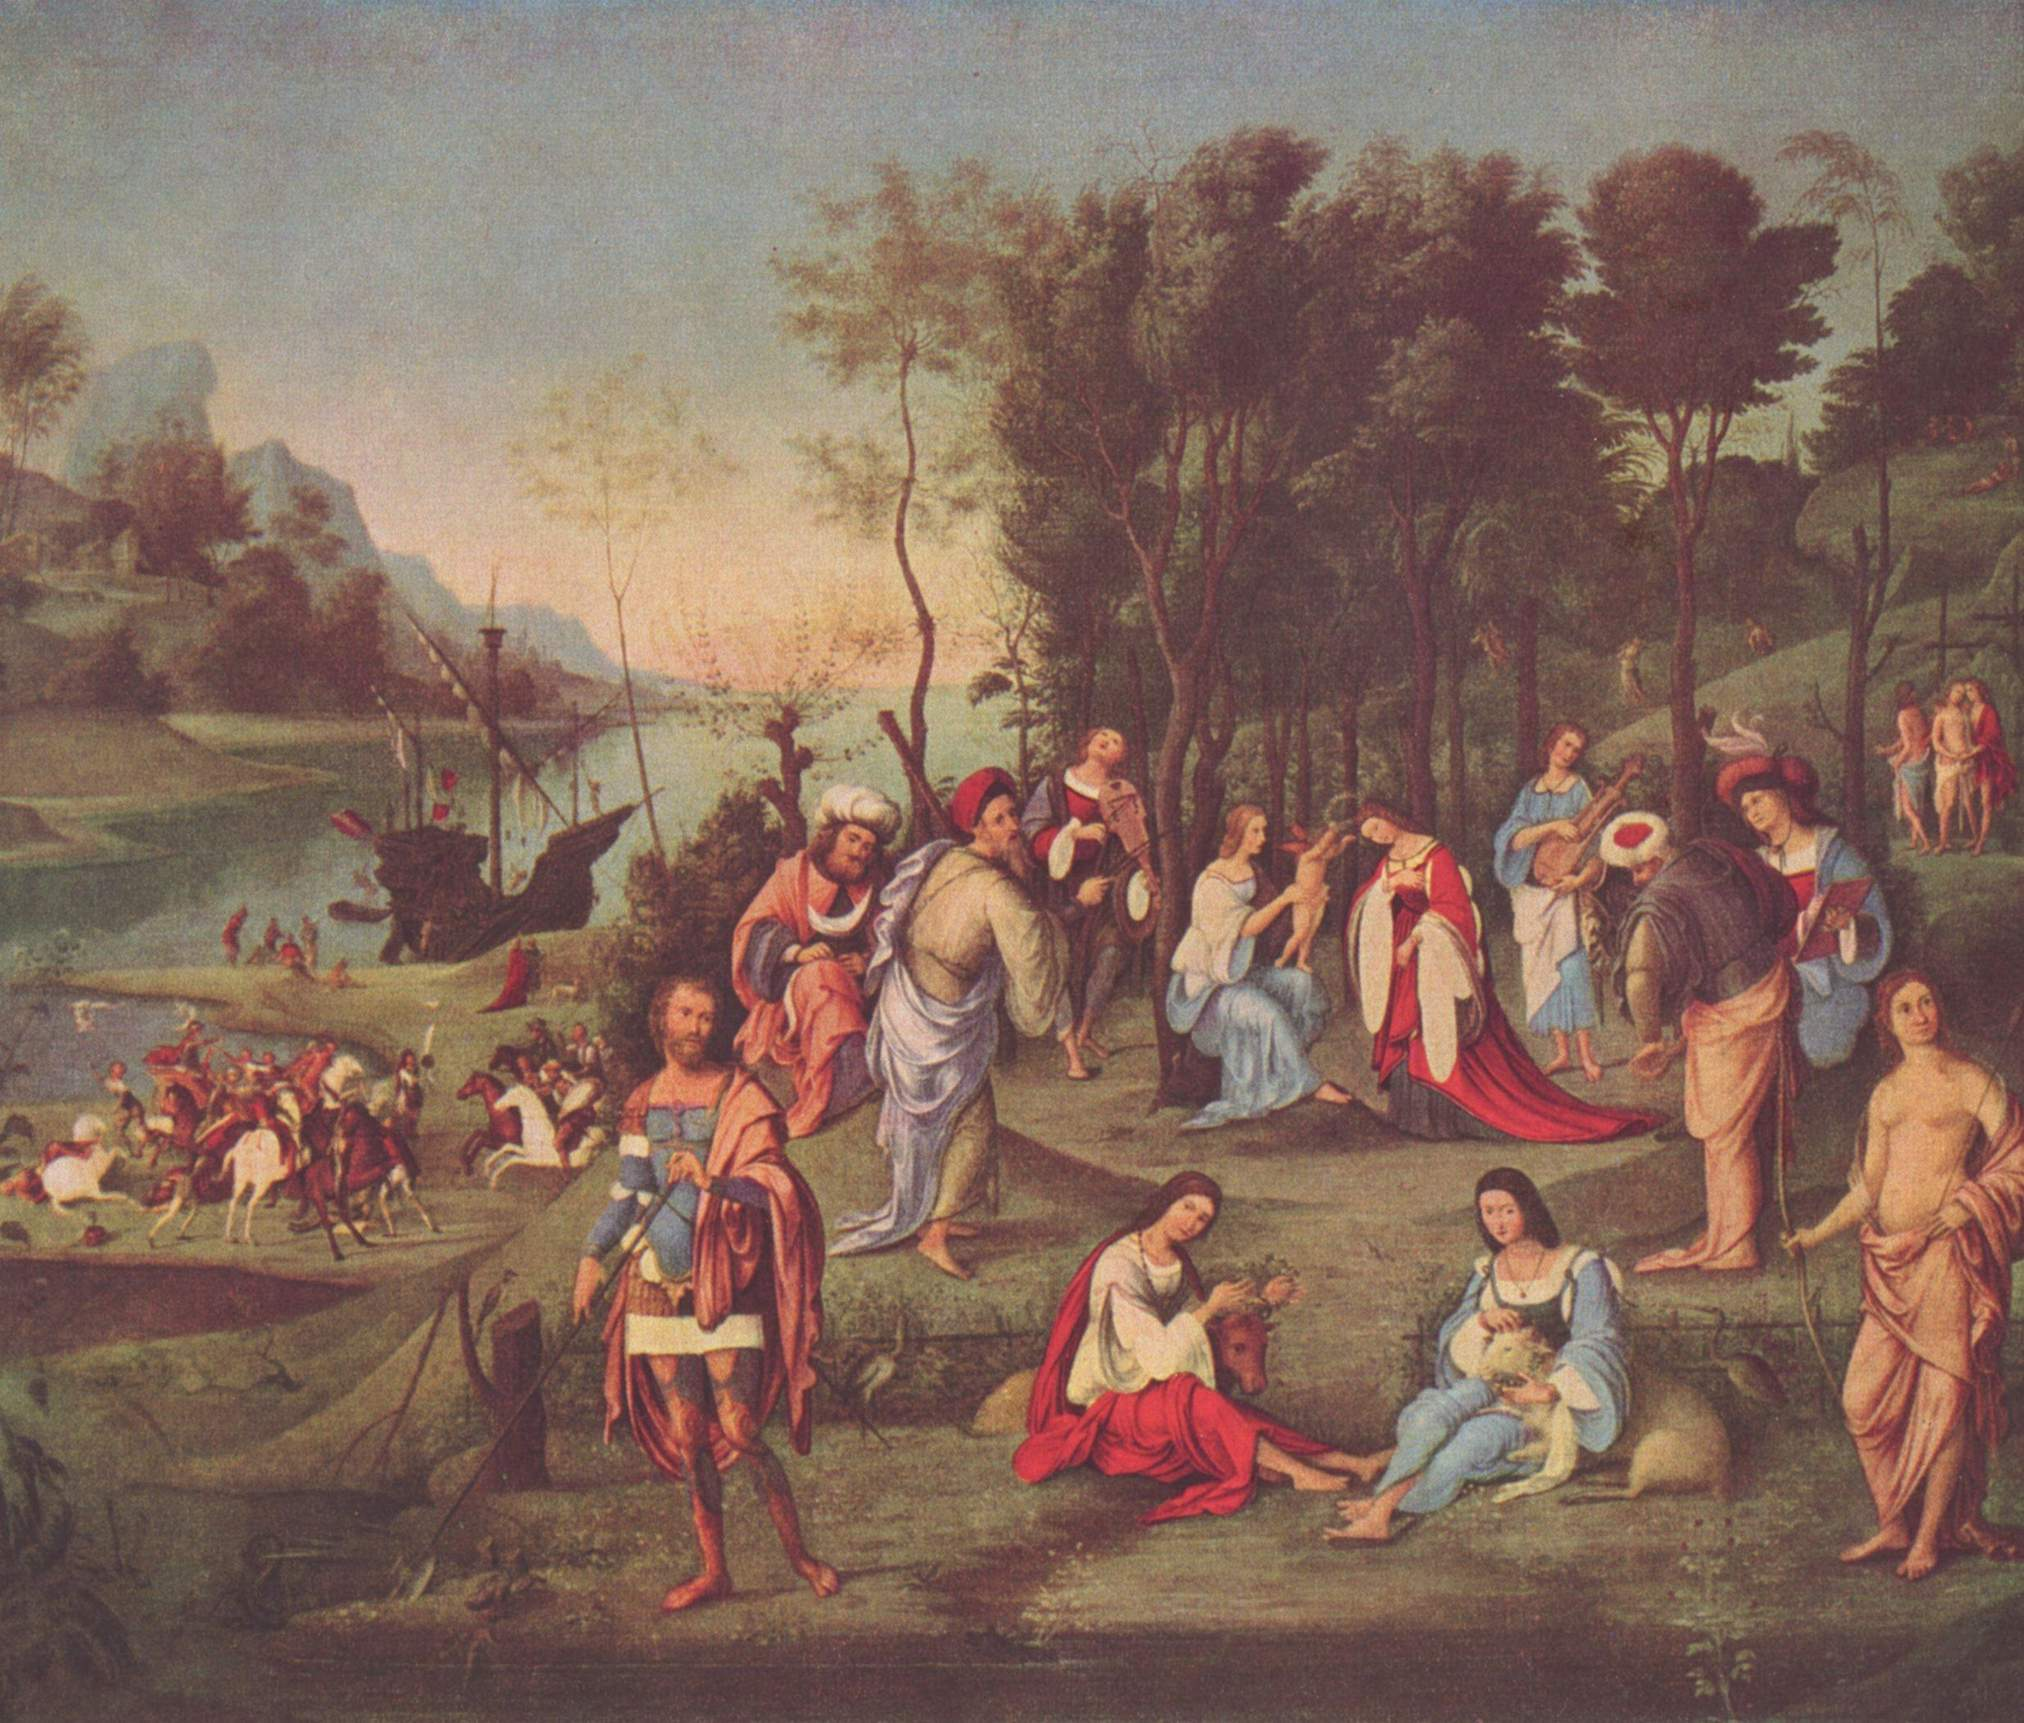 Il regno di Cosmo (правление космы, совета десяти), Коста Лоренцо